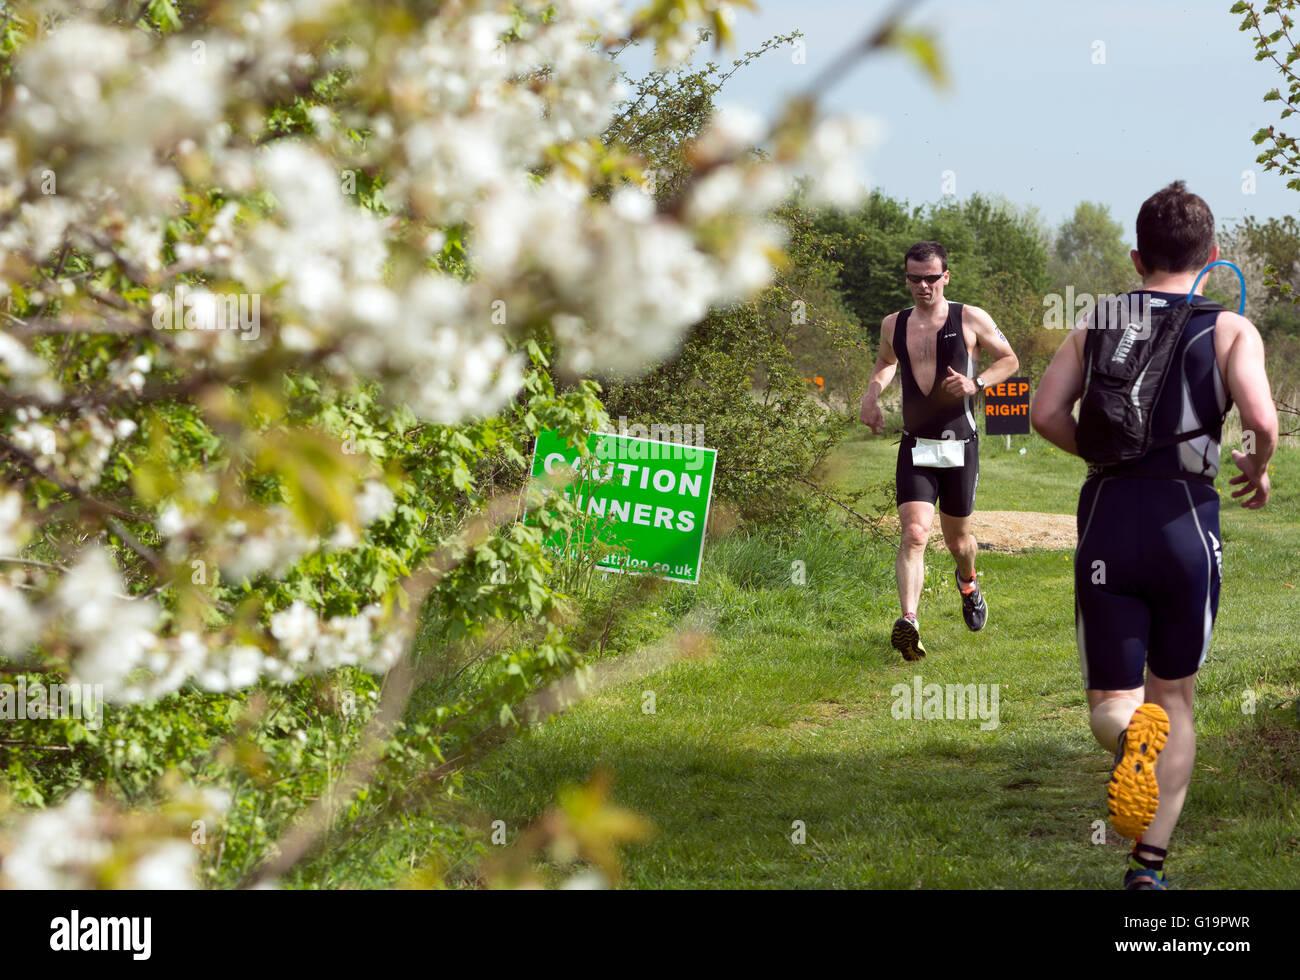 Runners in the Stratford Triathlon, UK - Stock Image